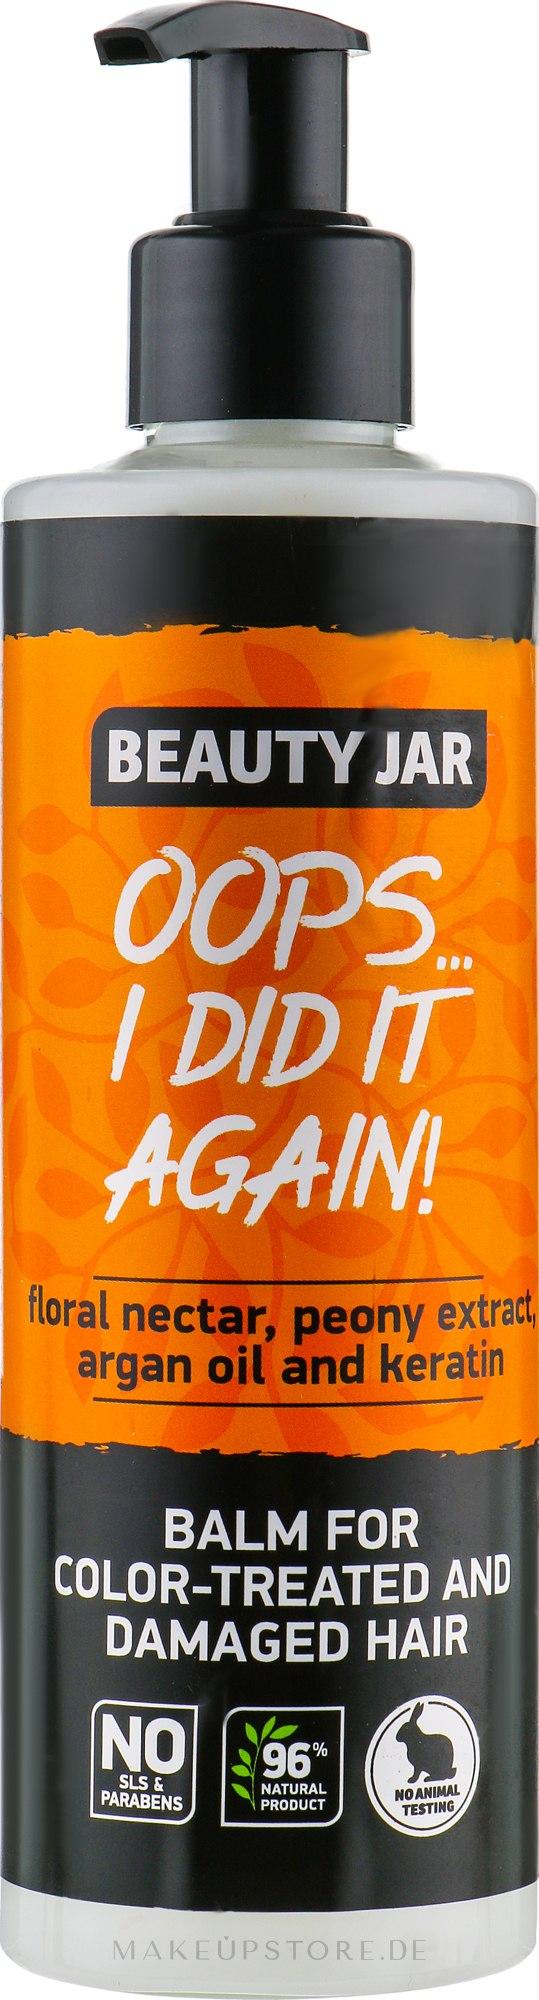 "Haarspülung ""Oops... I Did It Again!"" für gefärbtes und beschädigtes Haar - Beauty Jar Oops I Did It Again — Bild 250 ml"